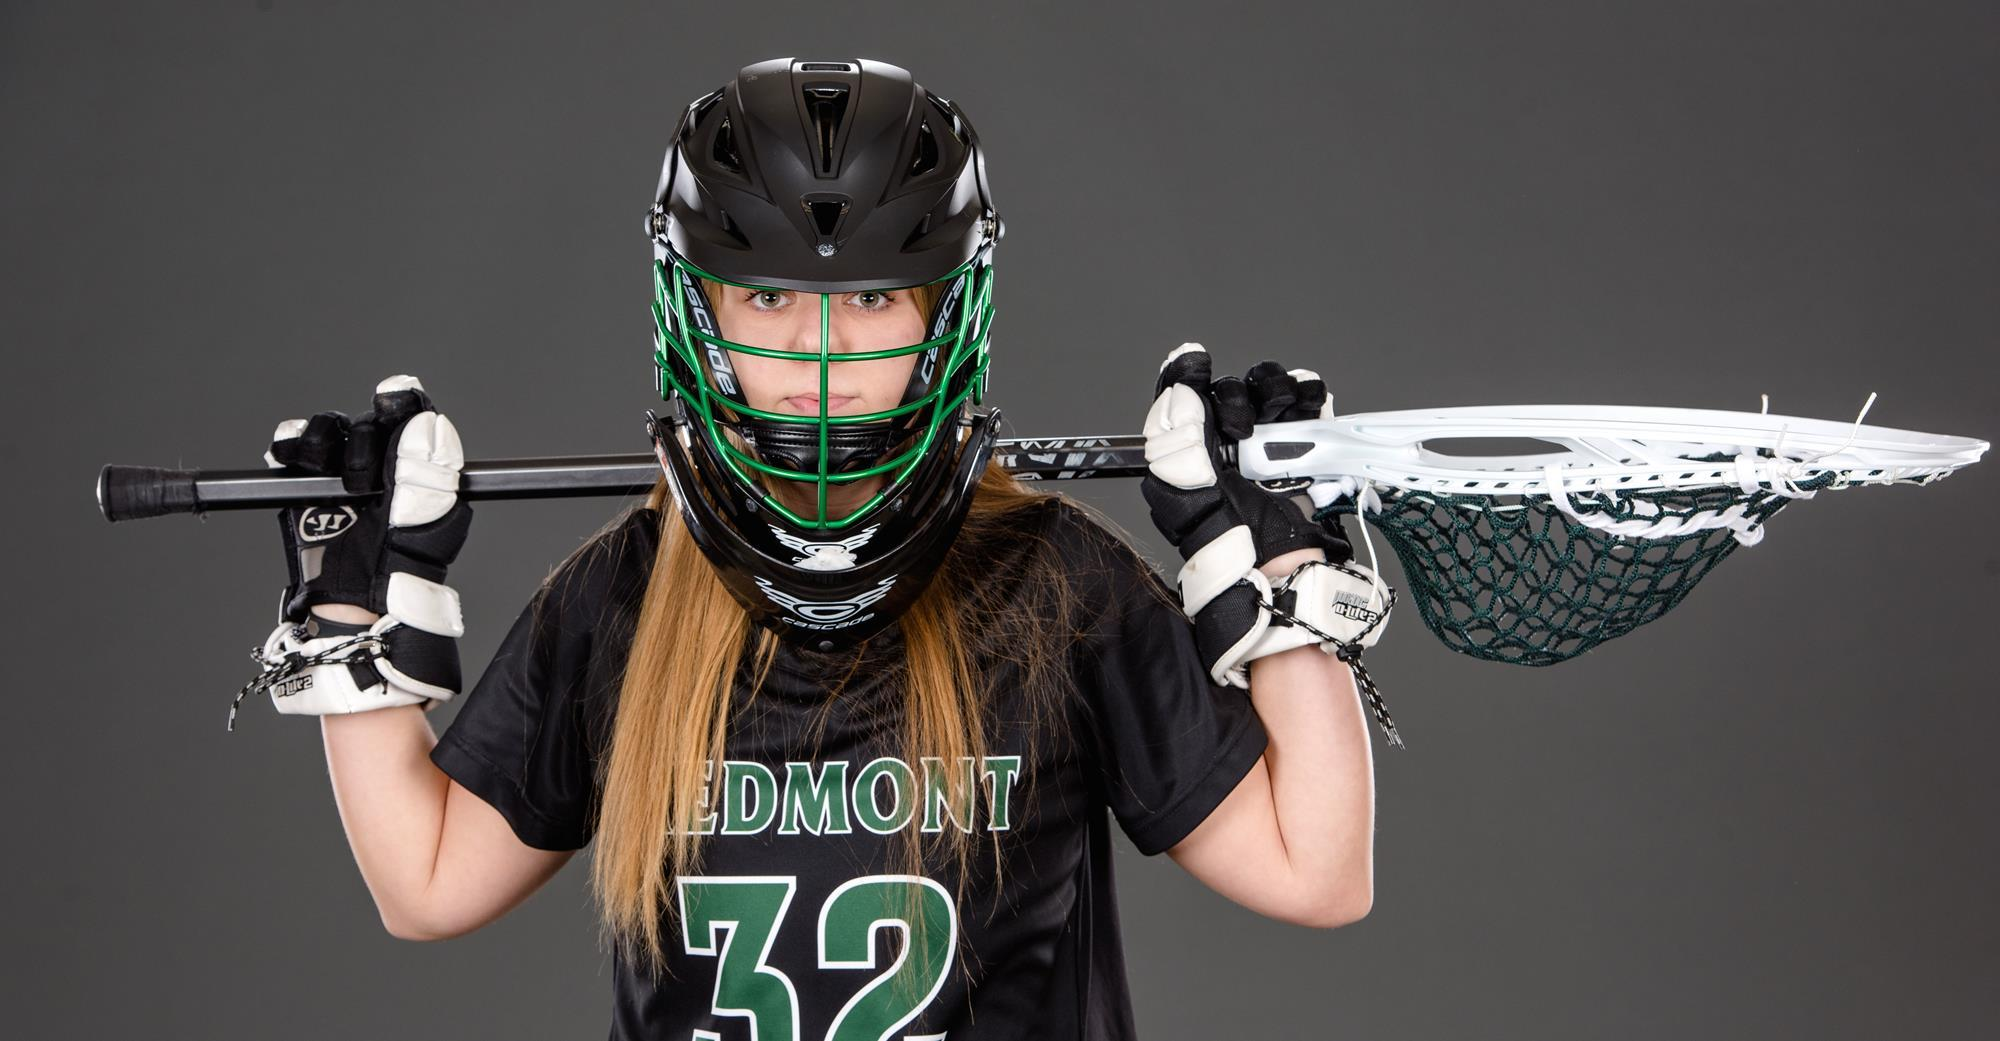 Mattie Keaton to Play Lacrosse for Team USA in Australia